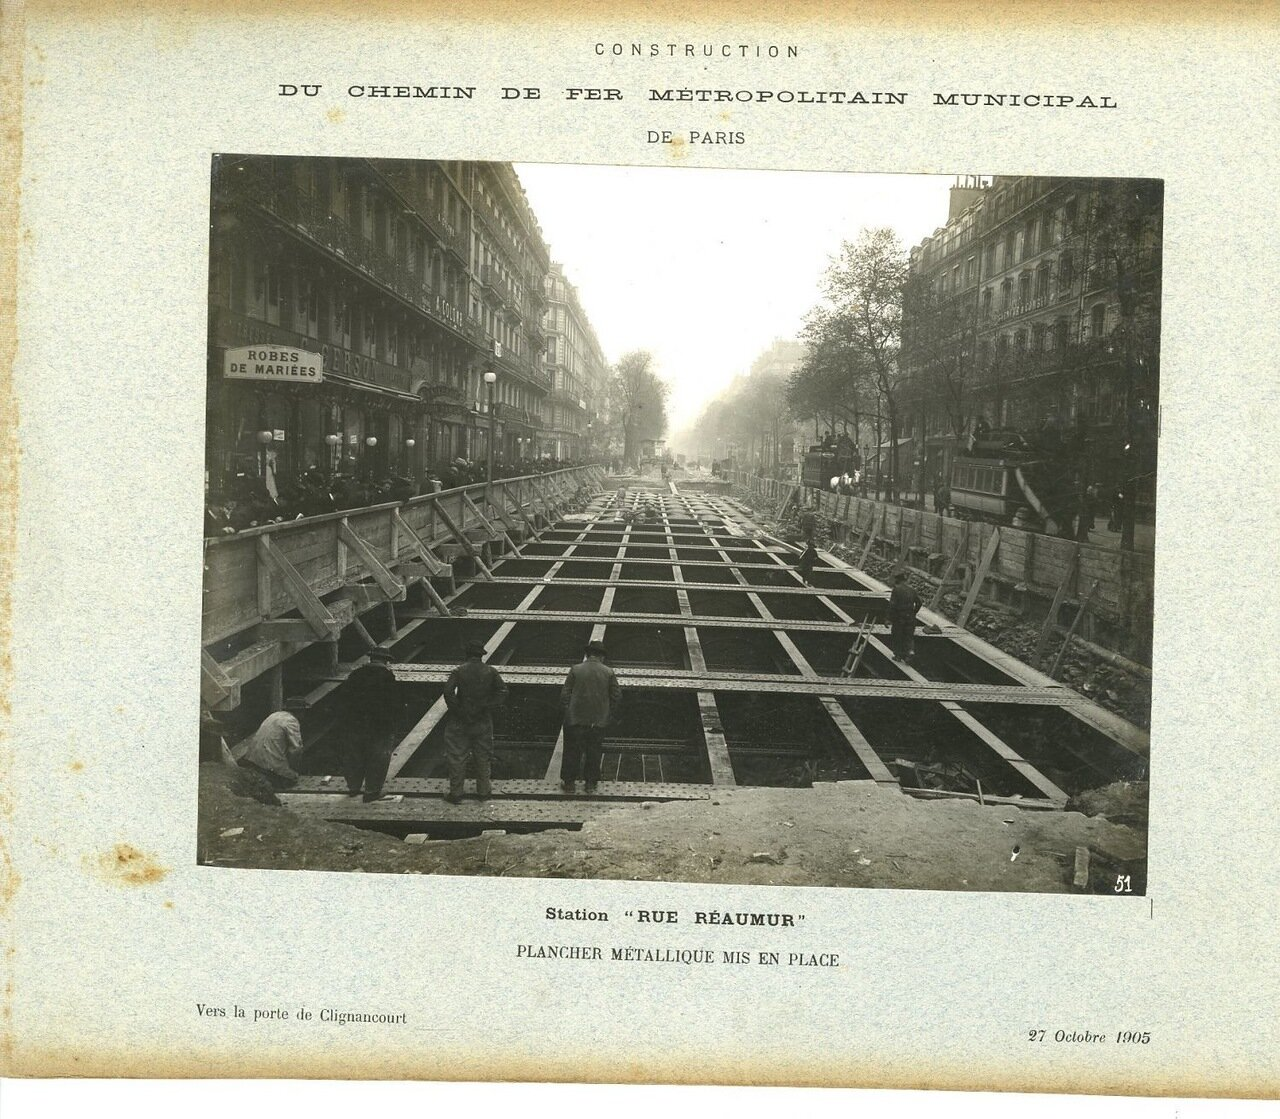 1905, 27 октября